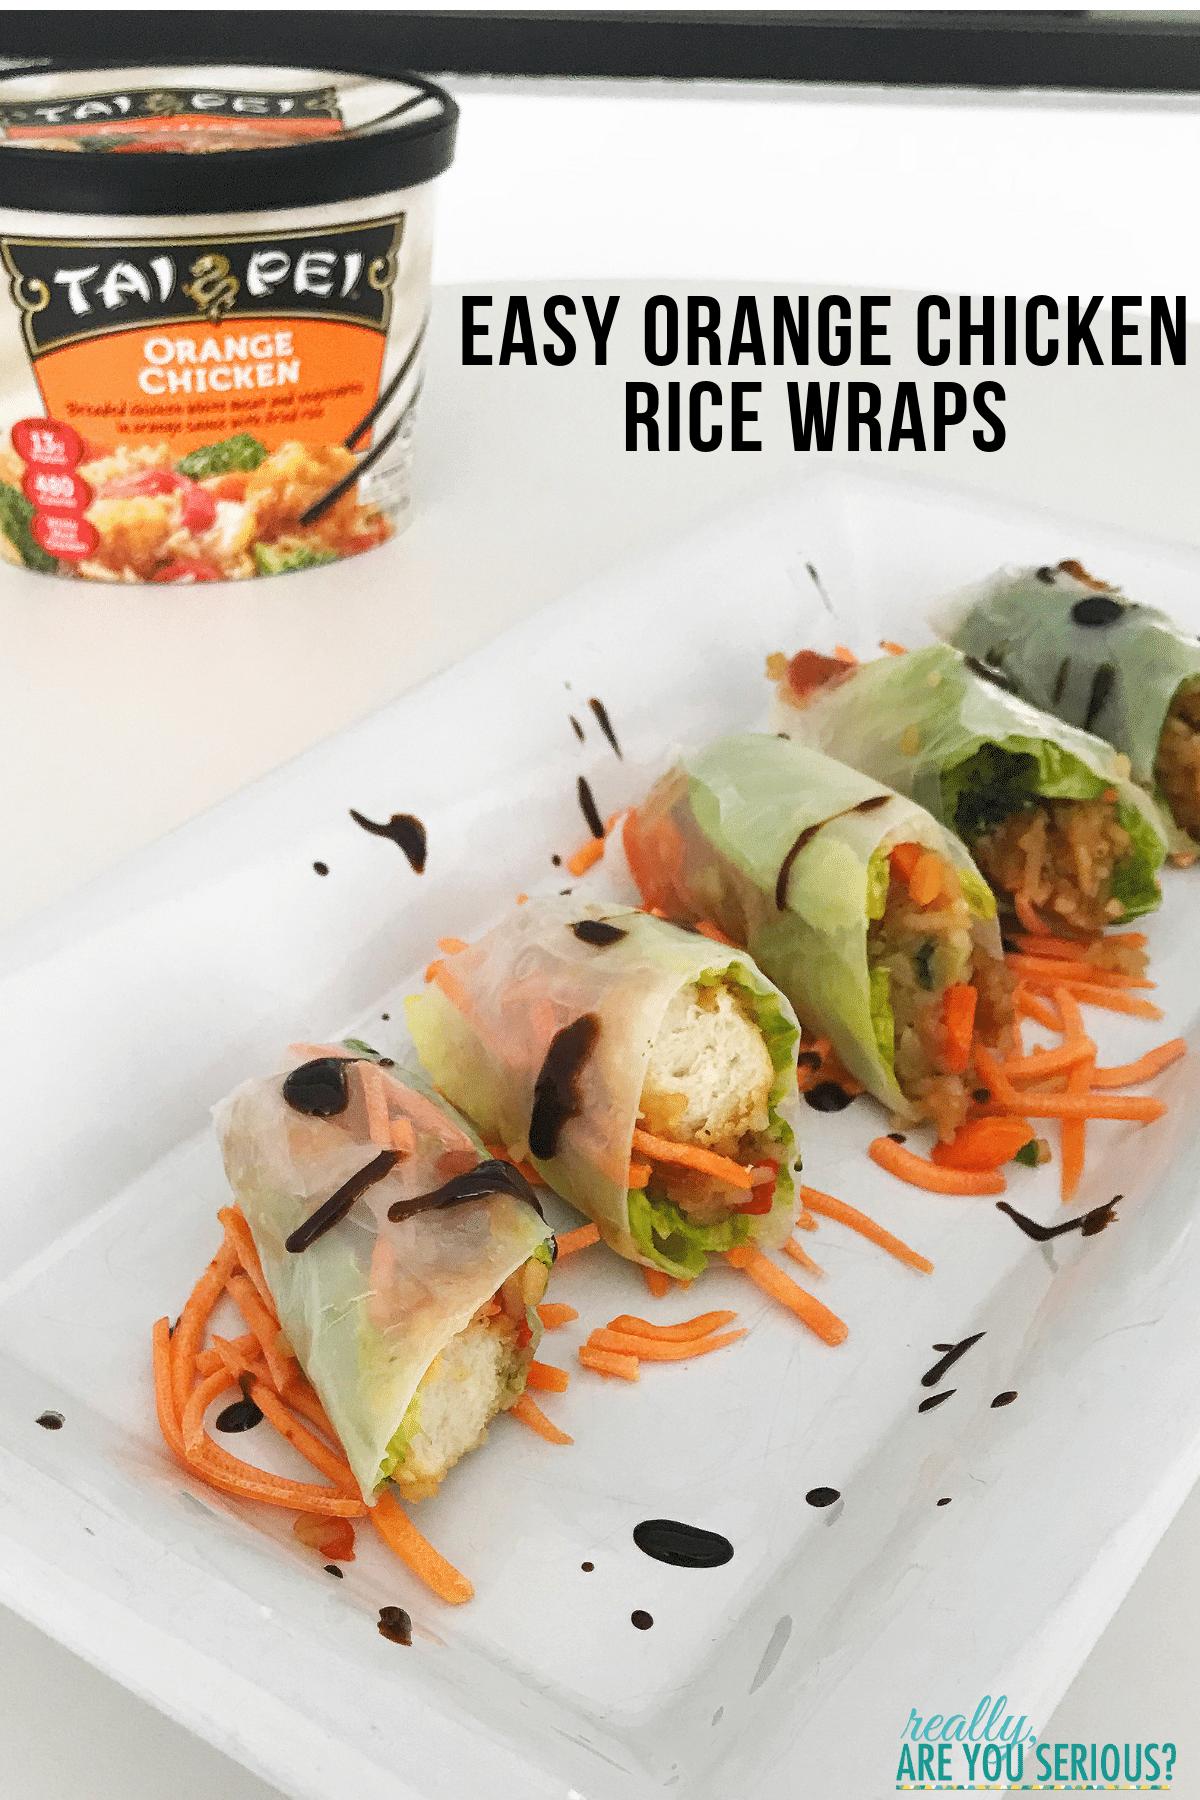 Easy orange chicken rice wraps